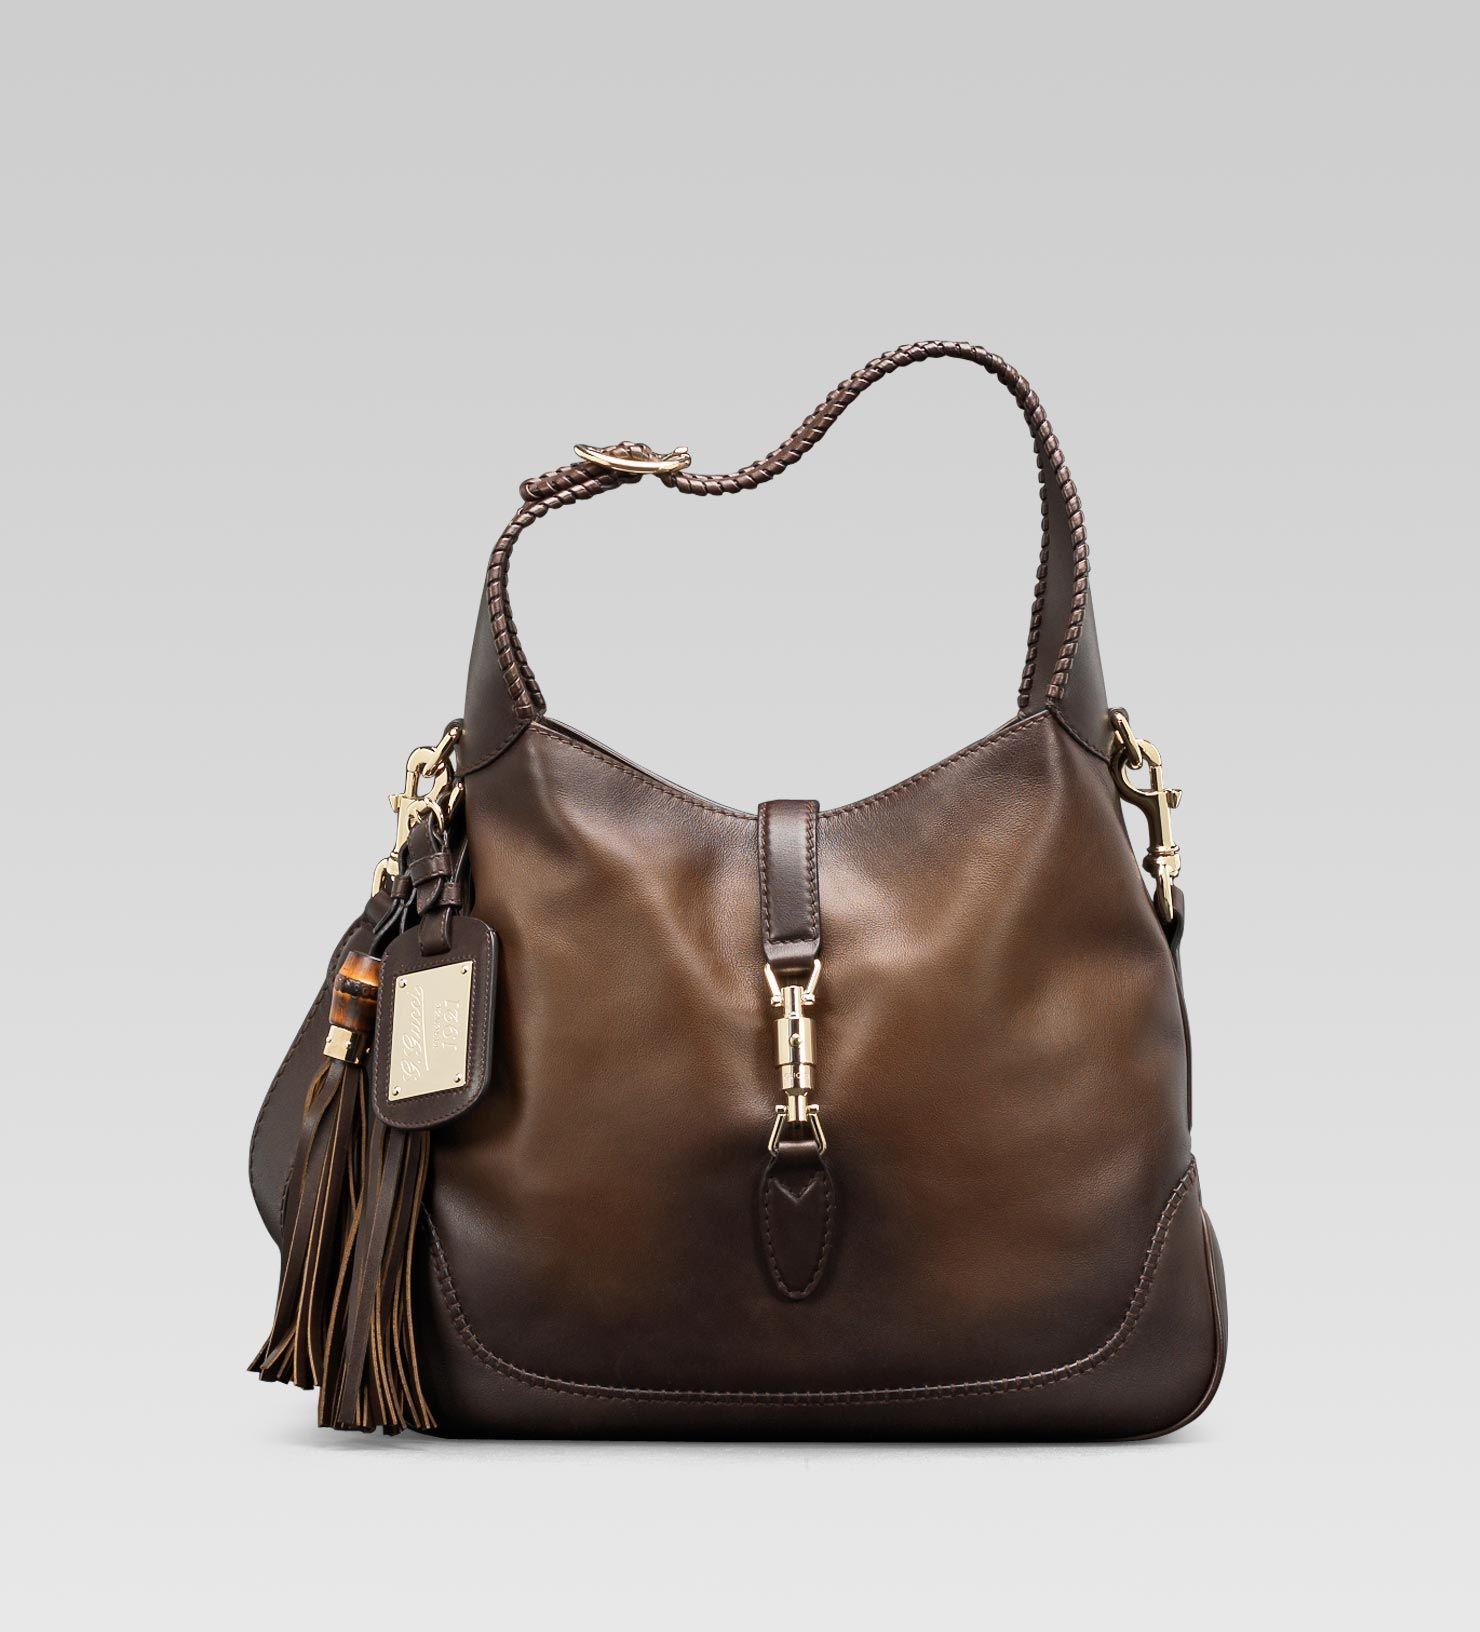 Designer Fake Handbags On Ed Authentic